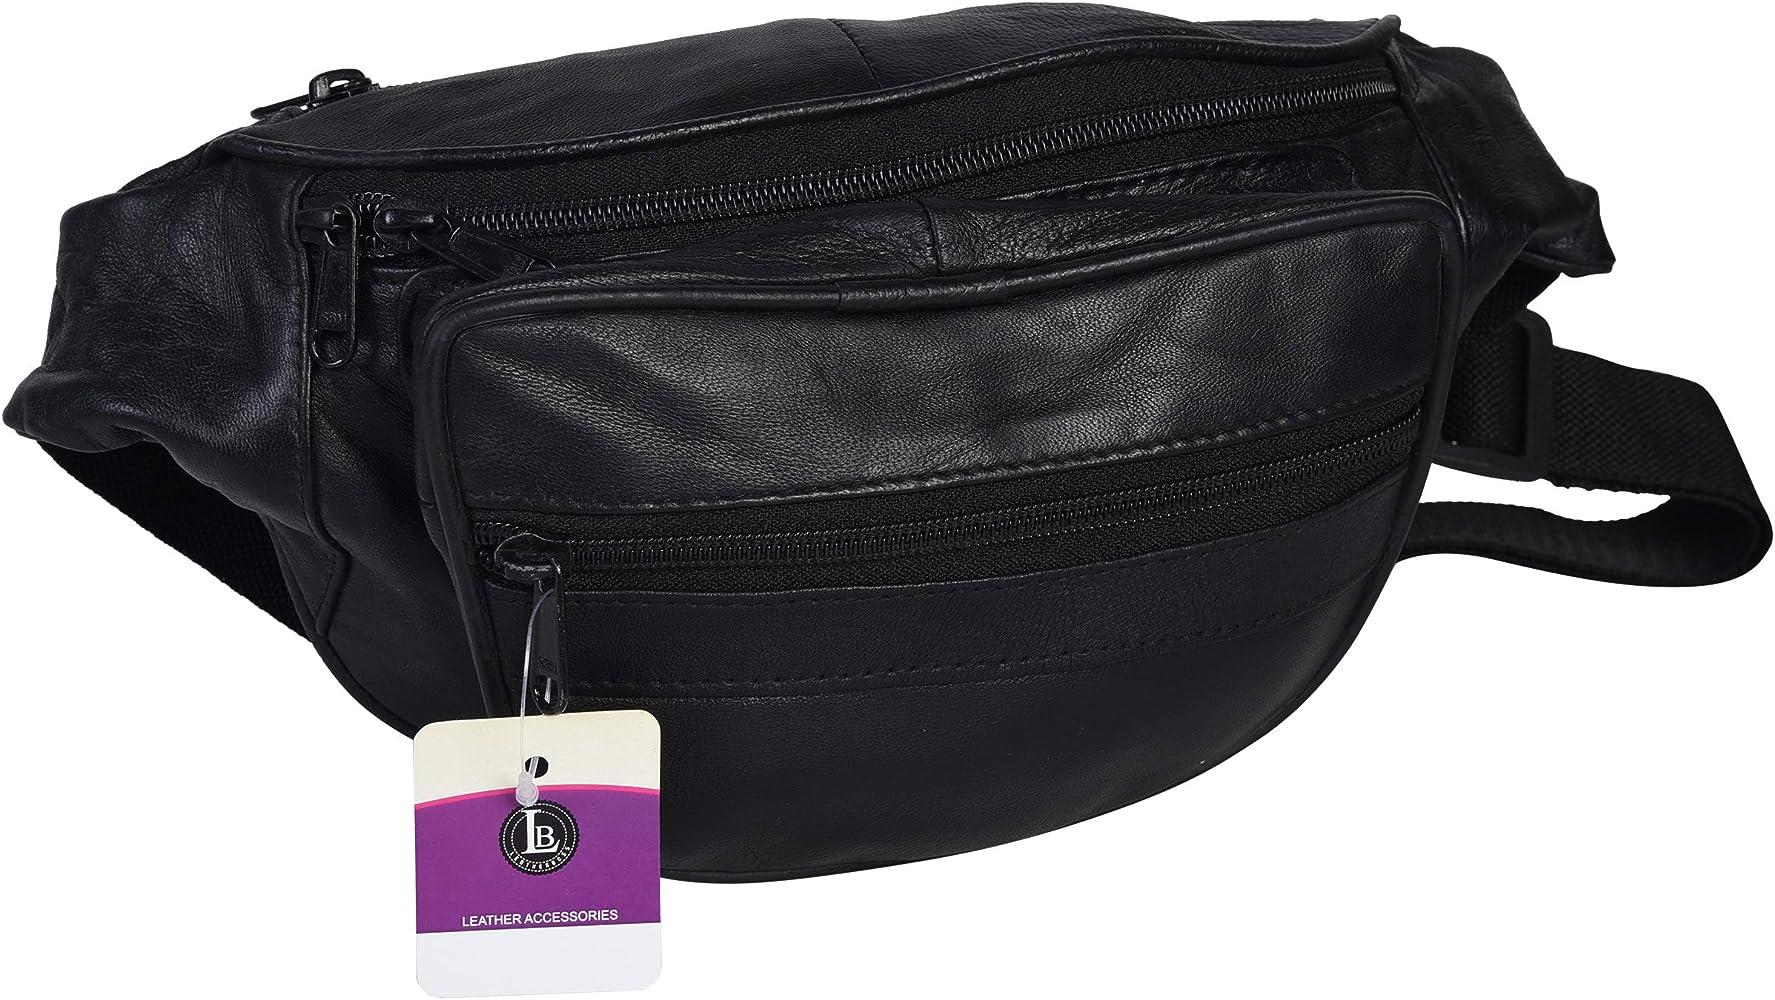 Rivets fanny pack for smartphone plus size Genuine black leather belt bag for woman